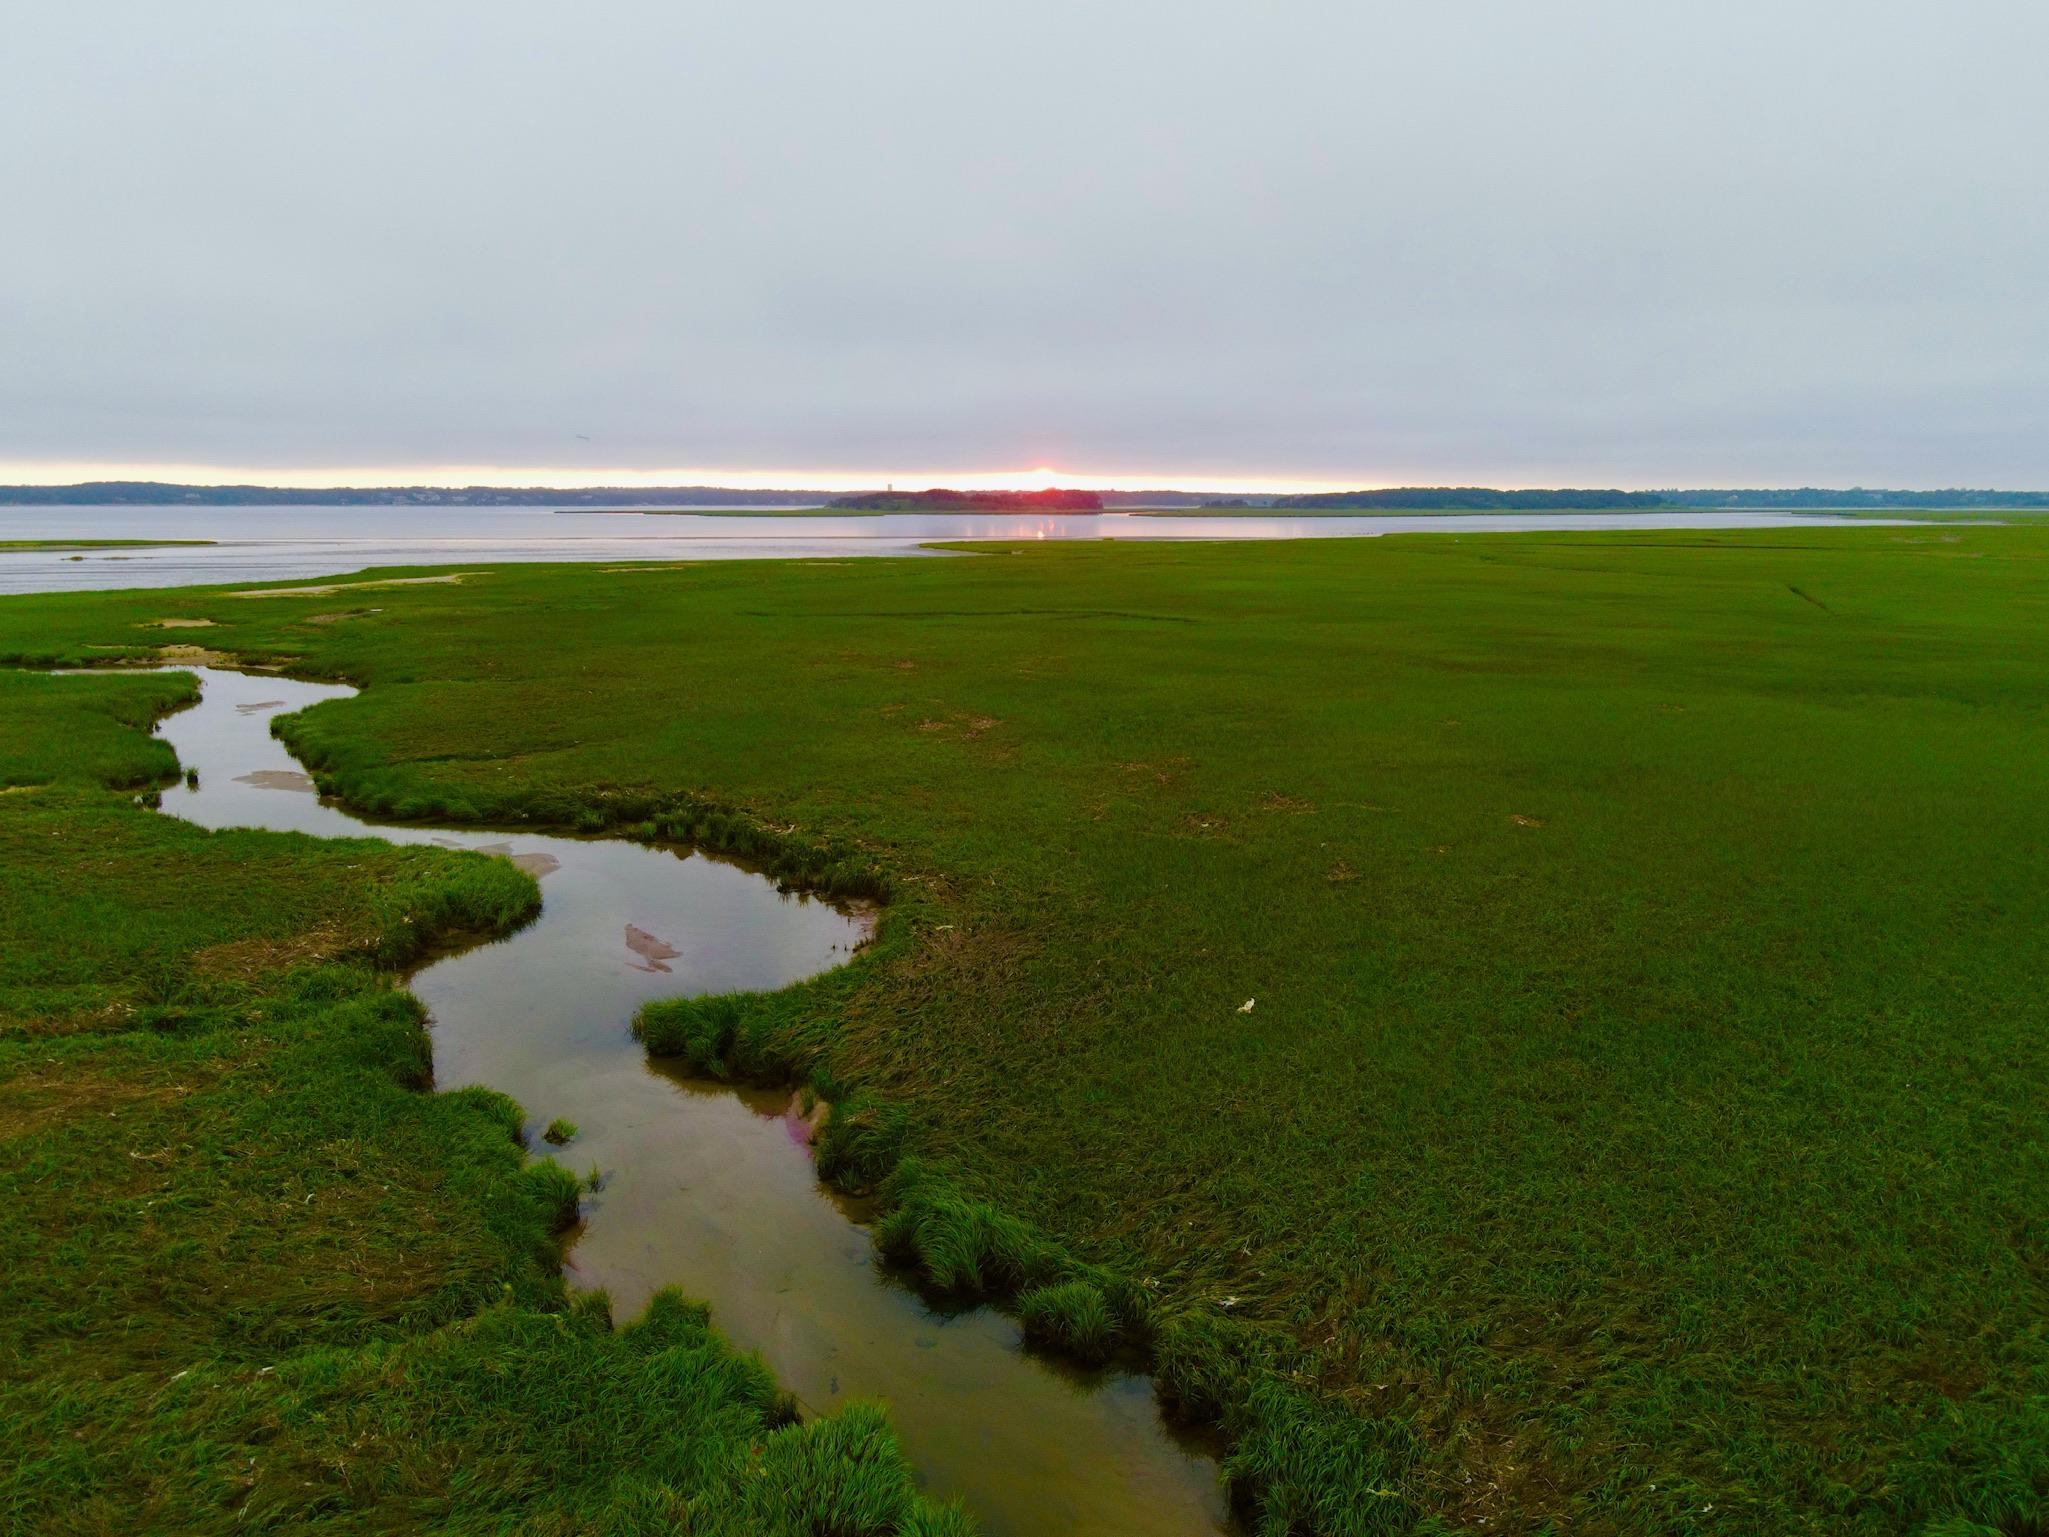 green marshland with ocean views